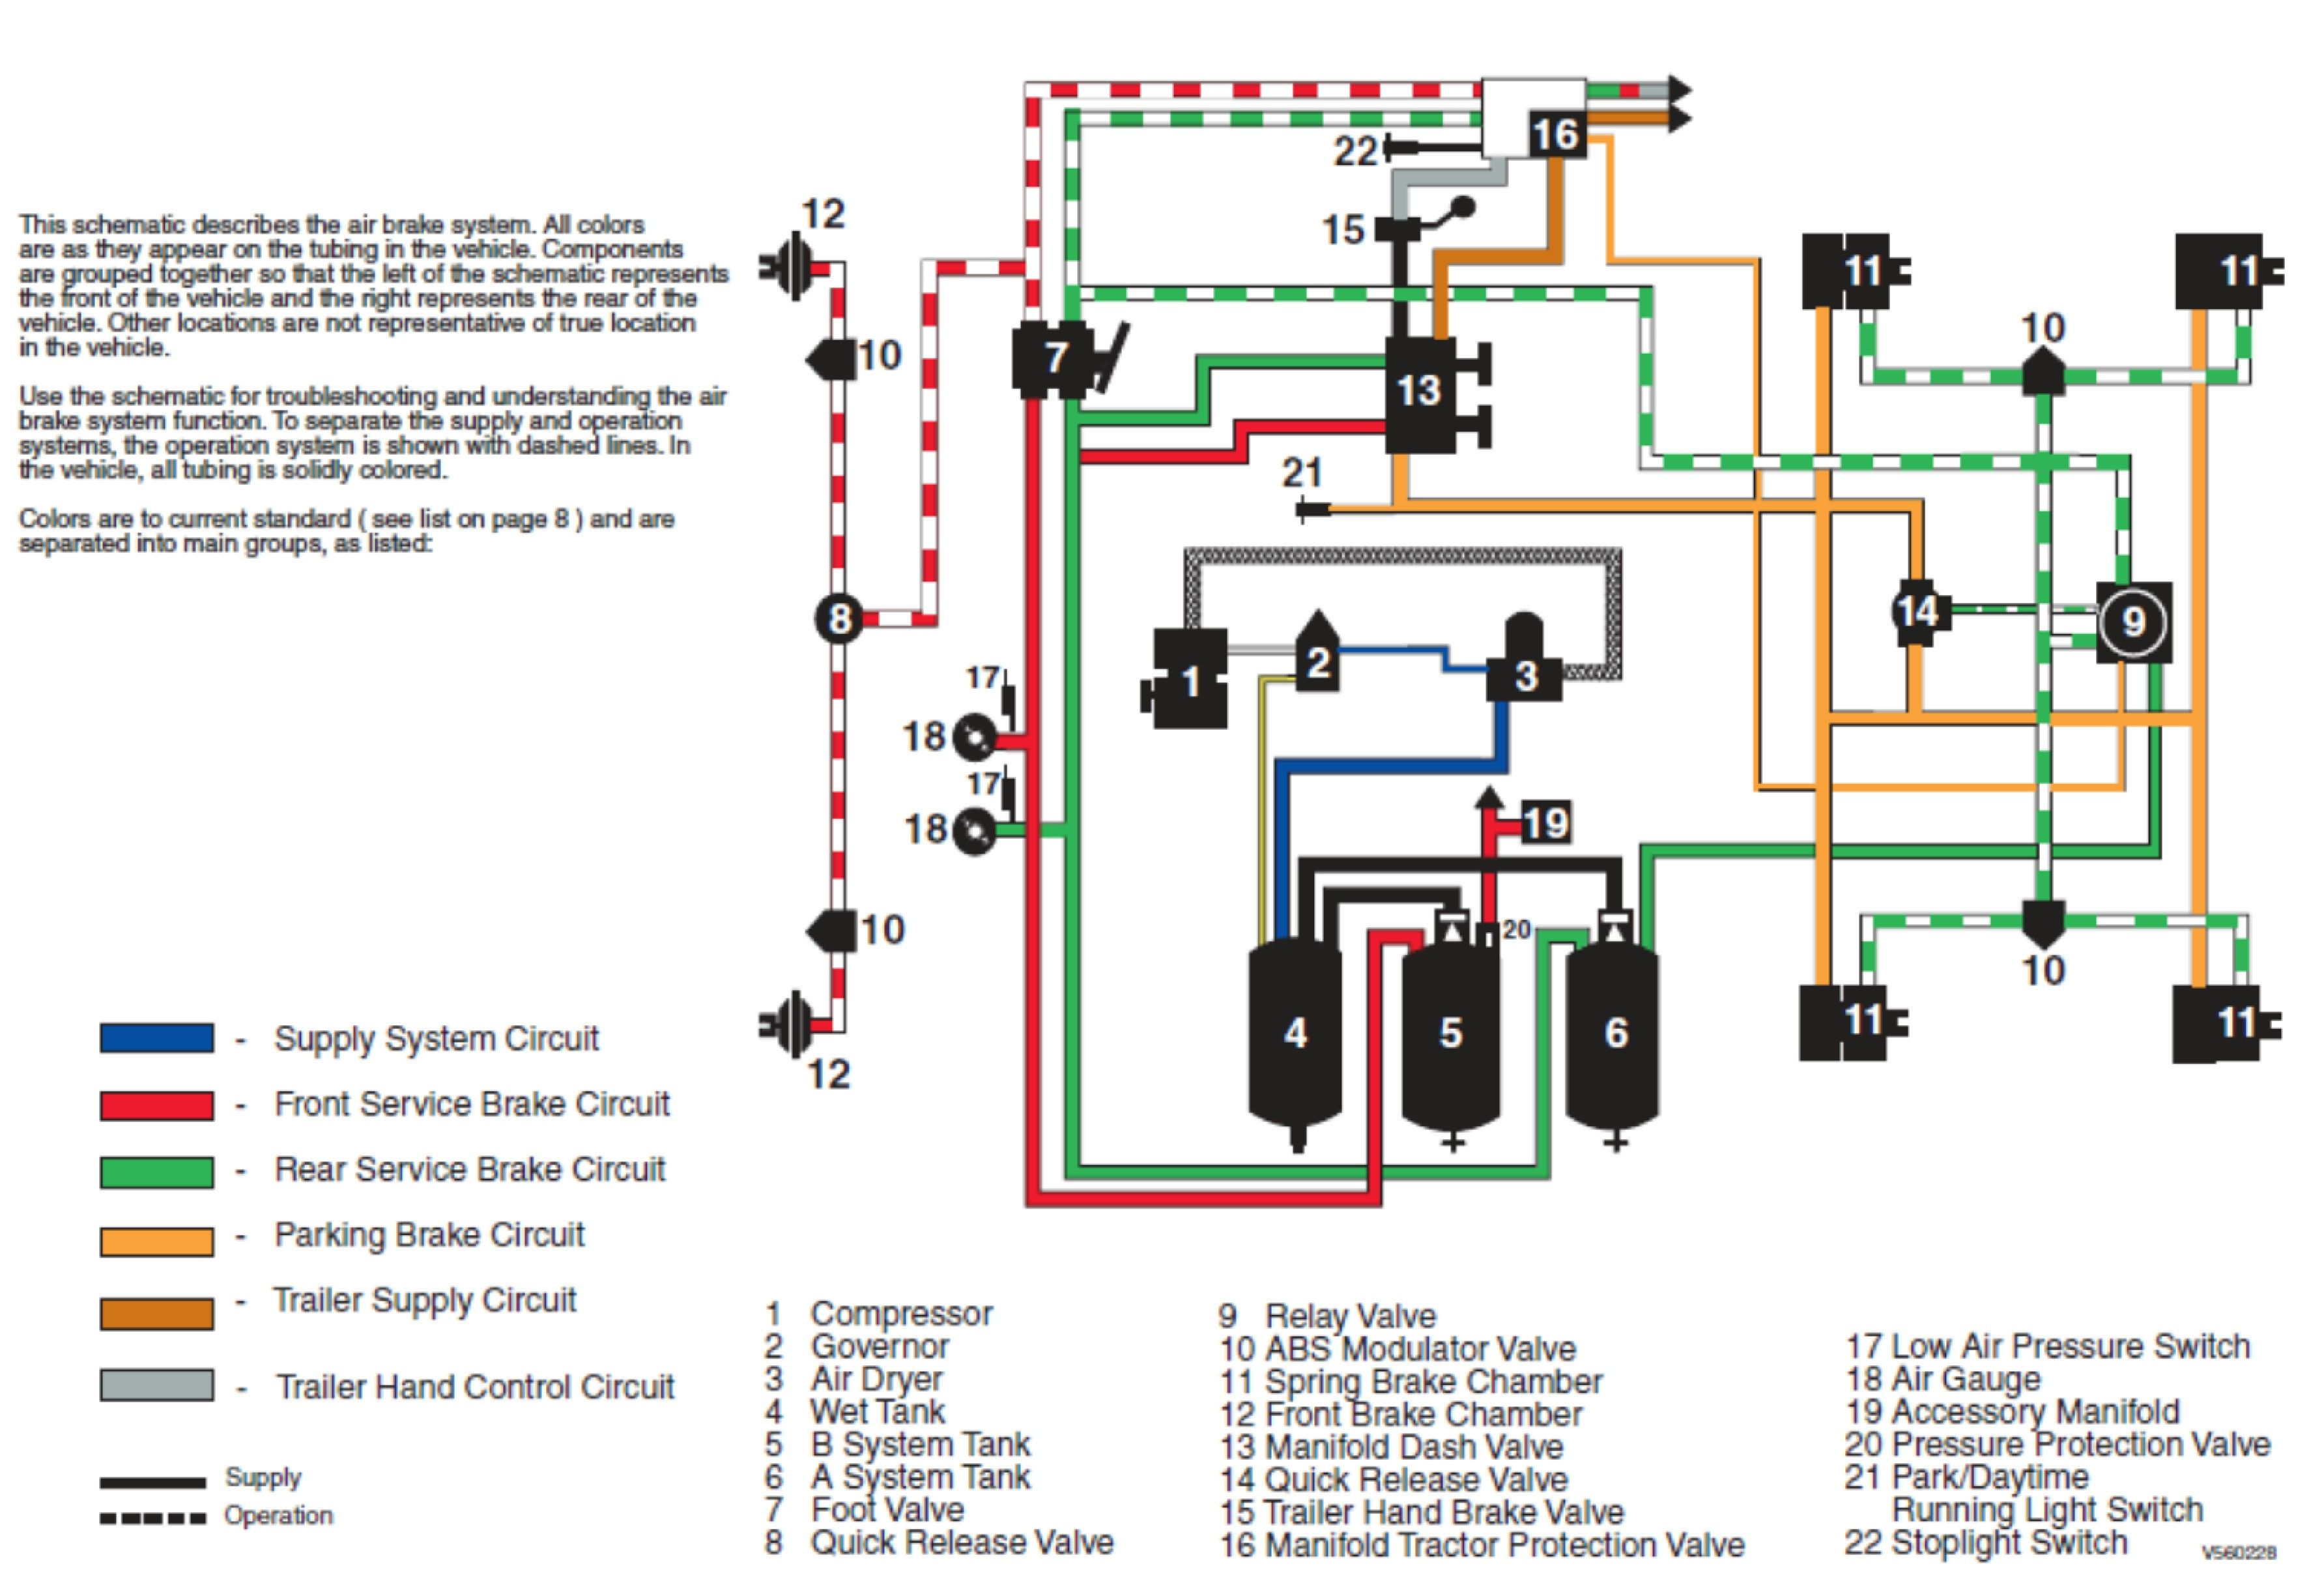 Fire Alarm Wiring Diagram Pdf Usb 2 0 Tractor-trailer Air Brake System | Pinterest Brake, ...